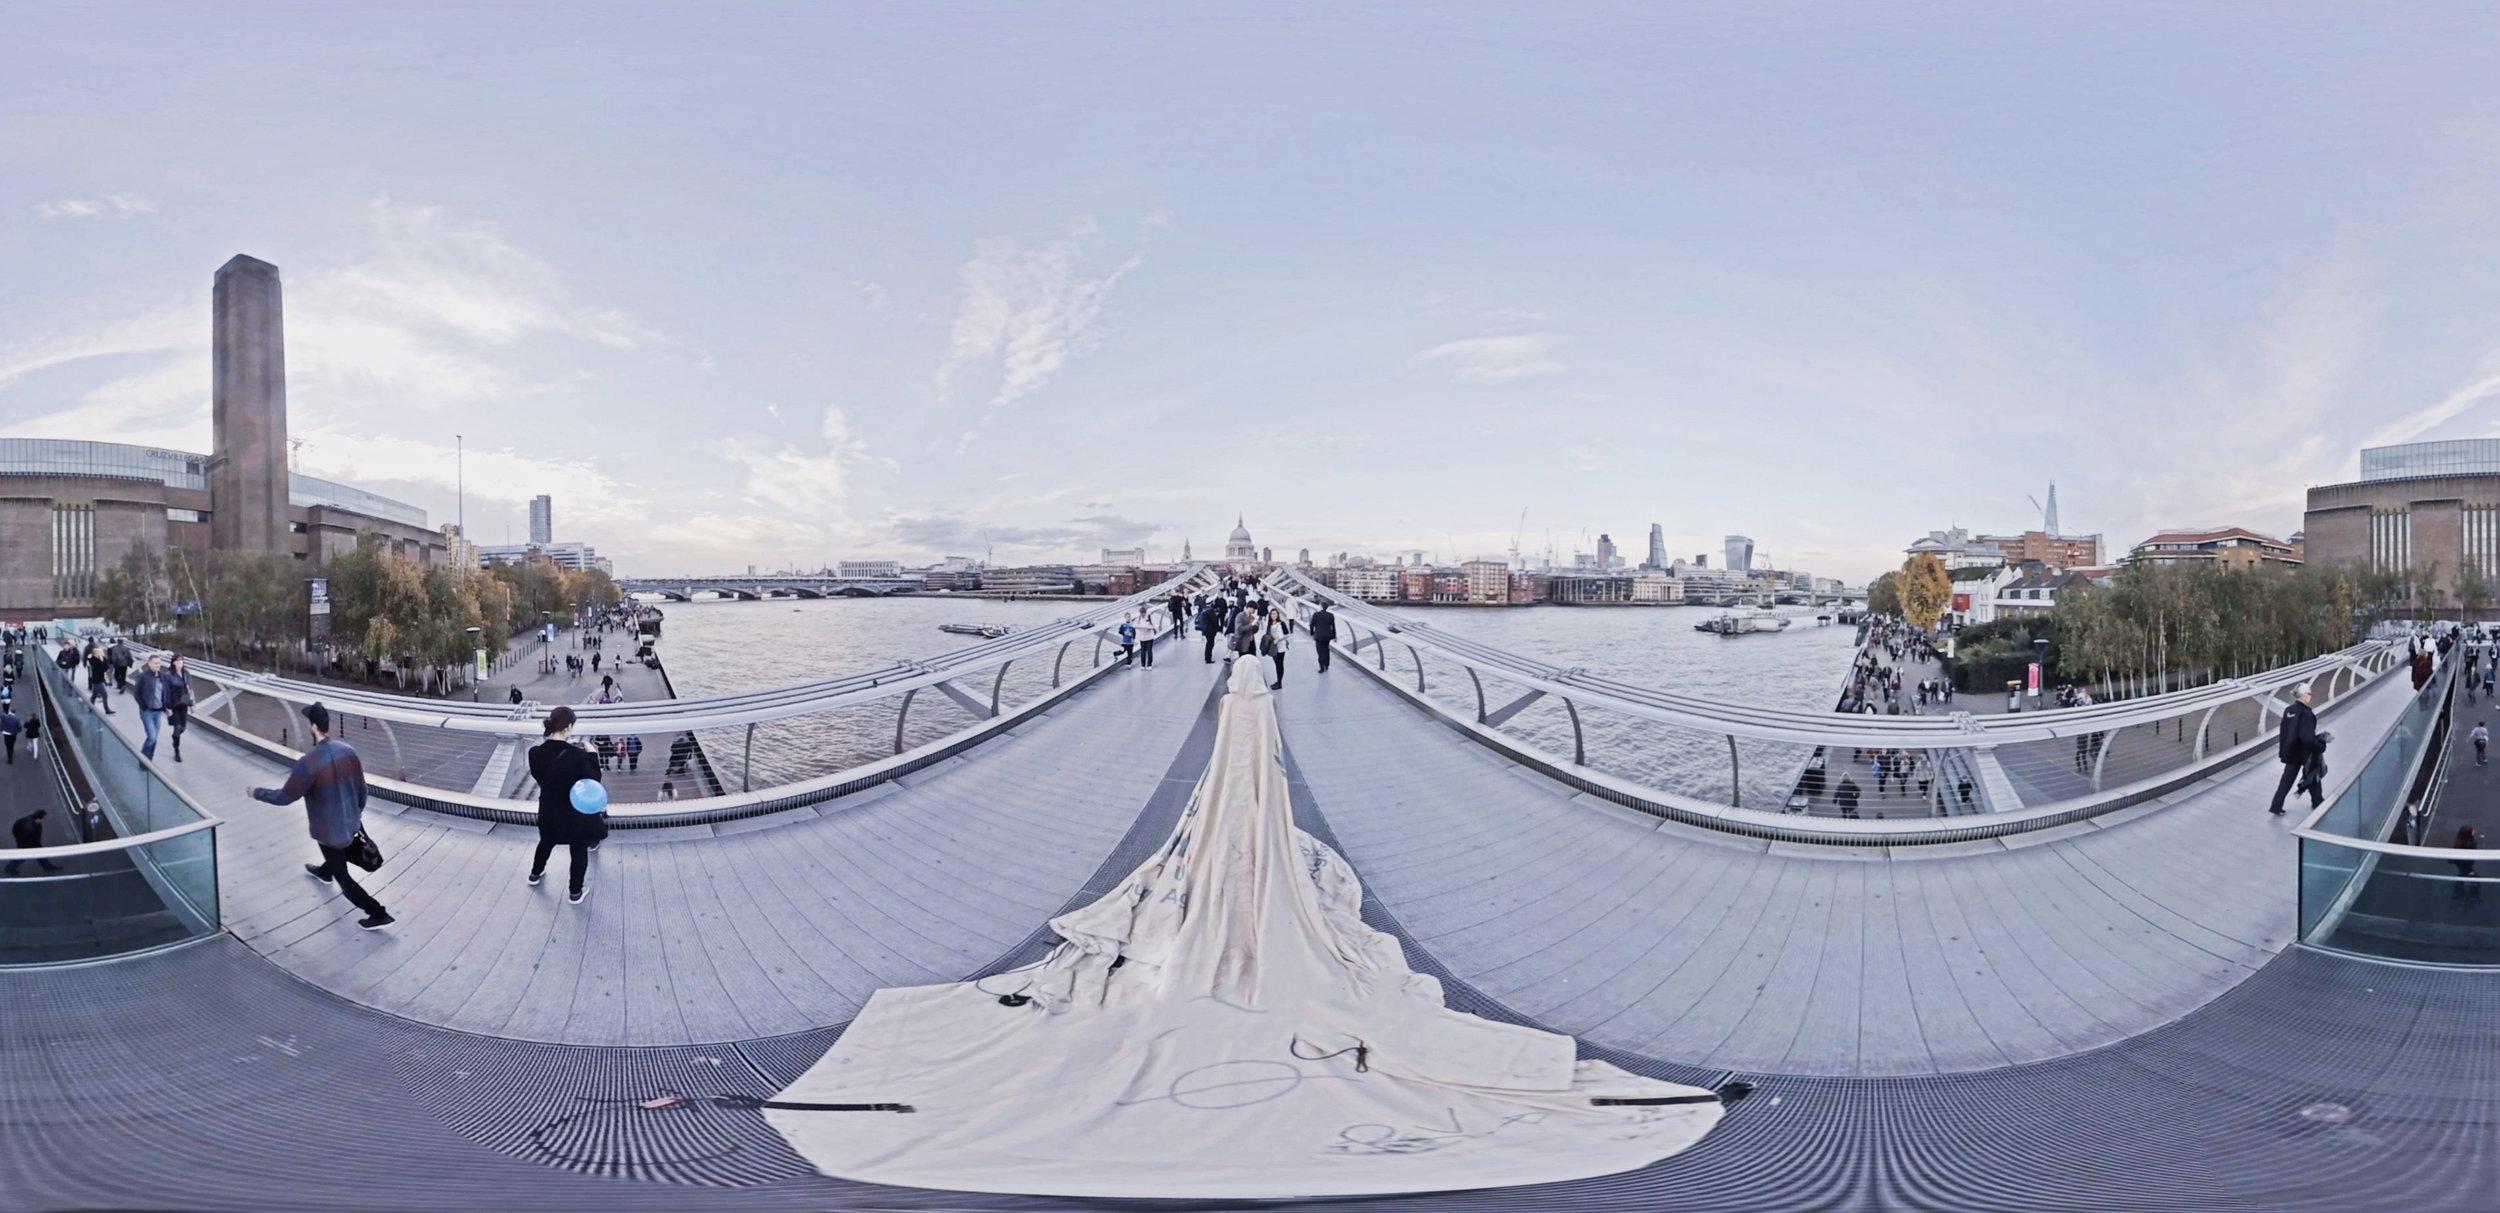 360 view the dress - Tate - St Pauls